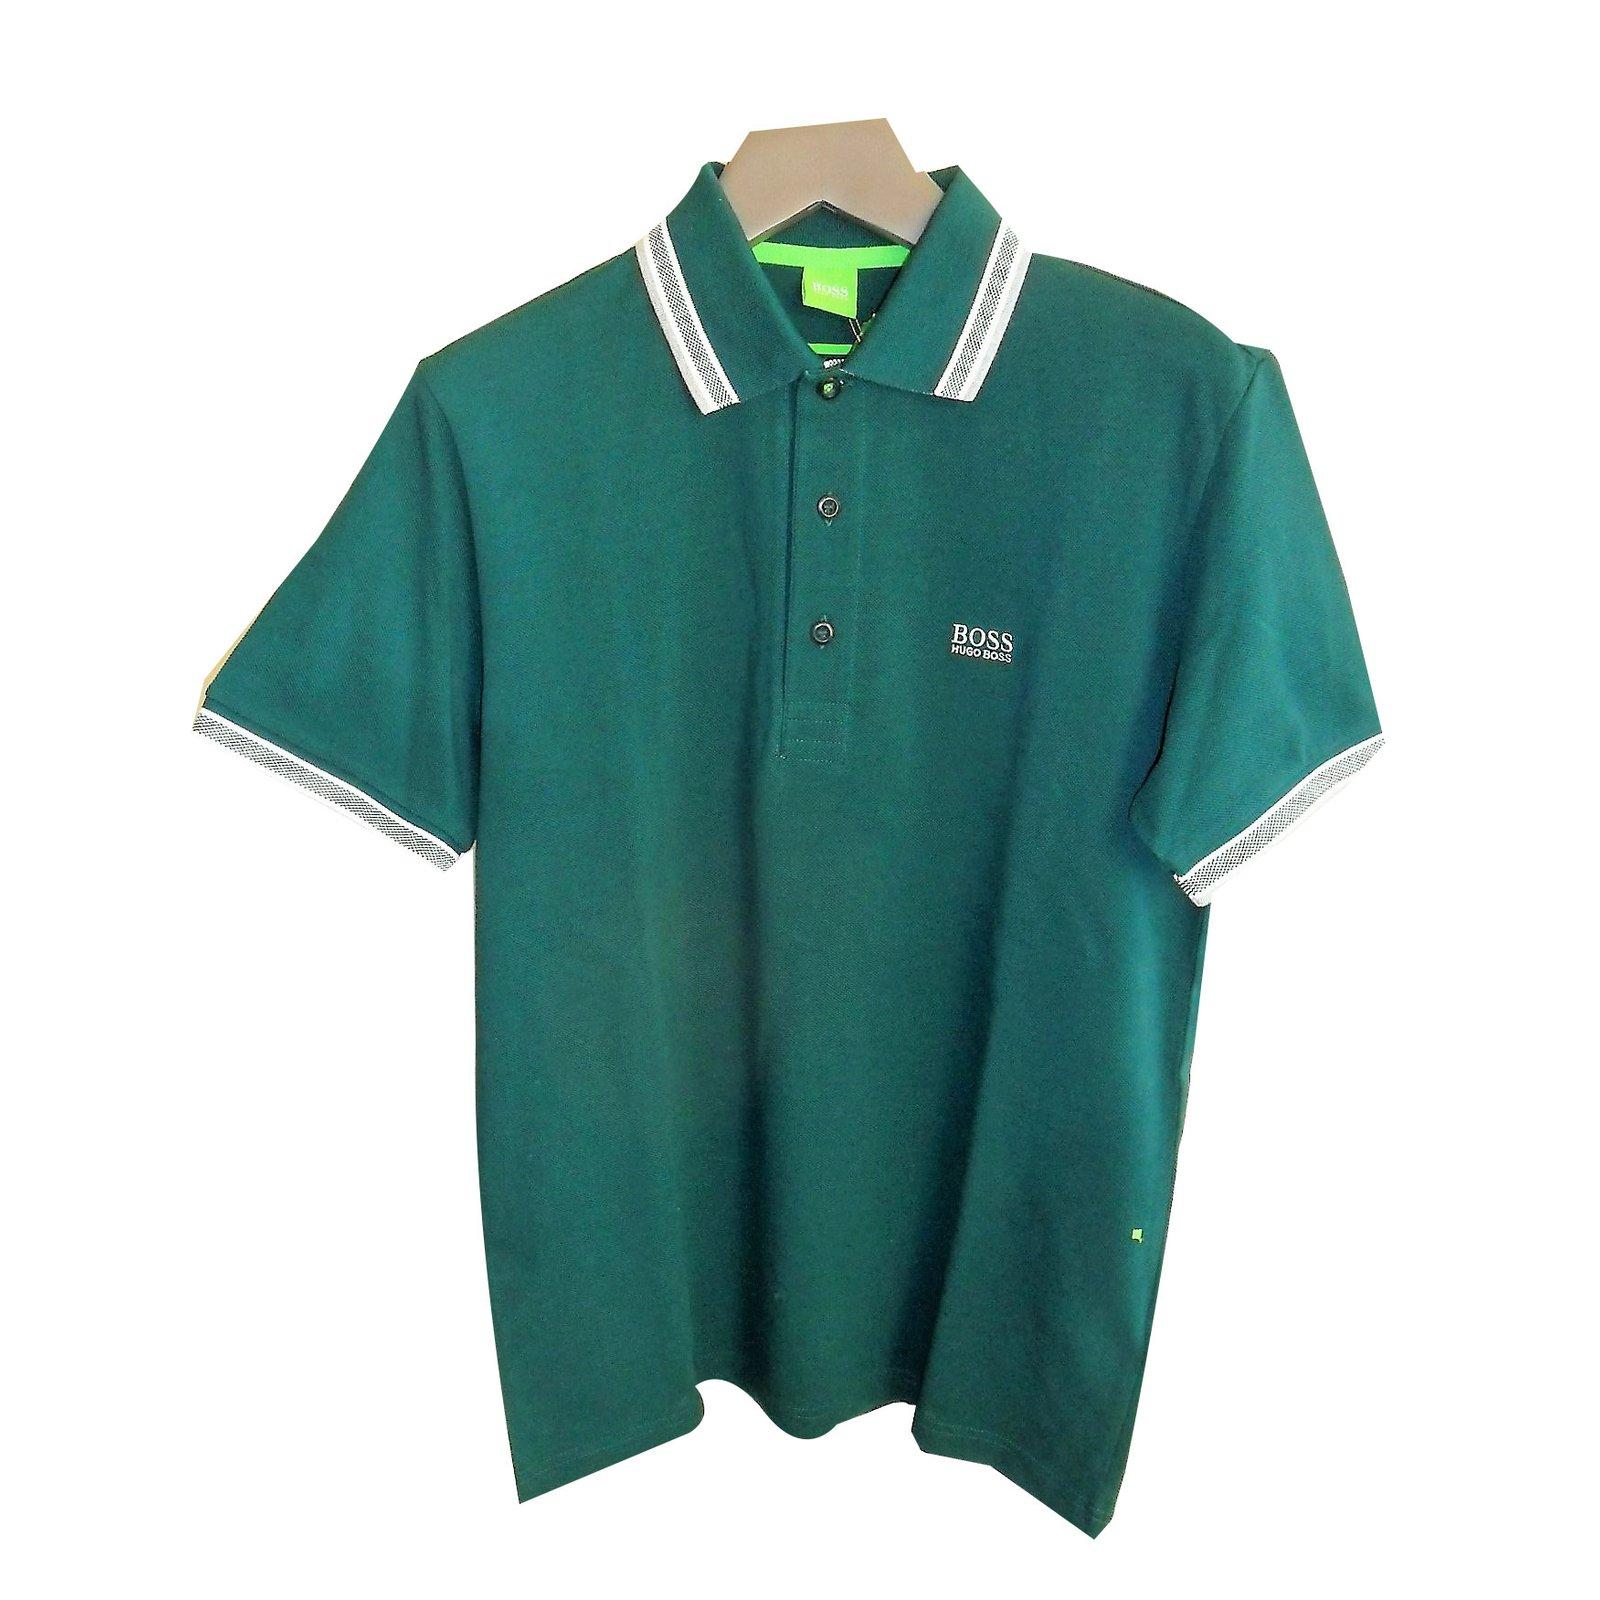 dbf4dd156 Hugo Boss Hugo boss brand new men's green polo shirt Polos Cotton Green  ref.57068